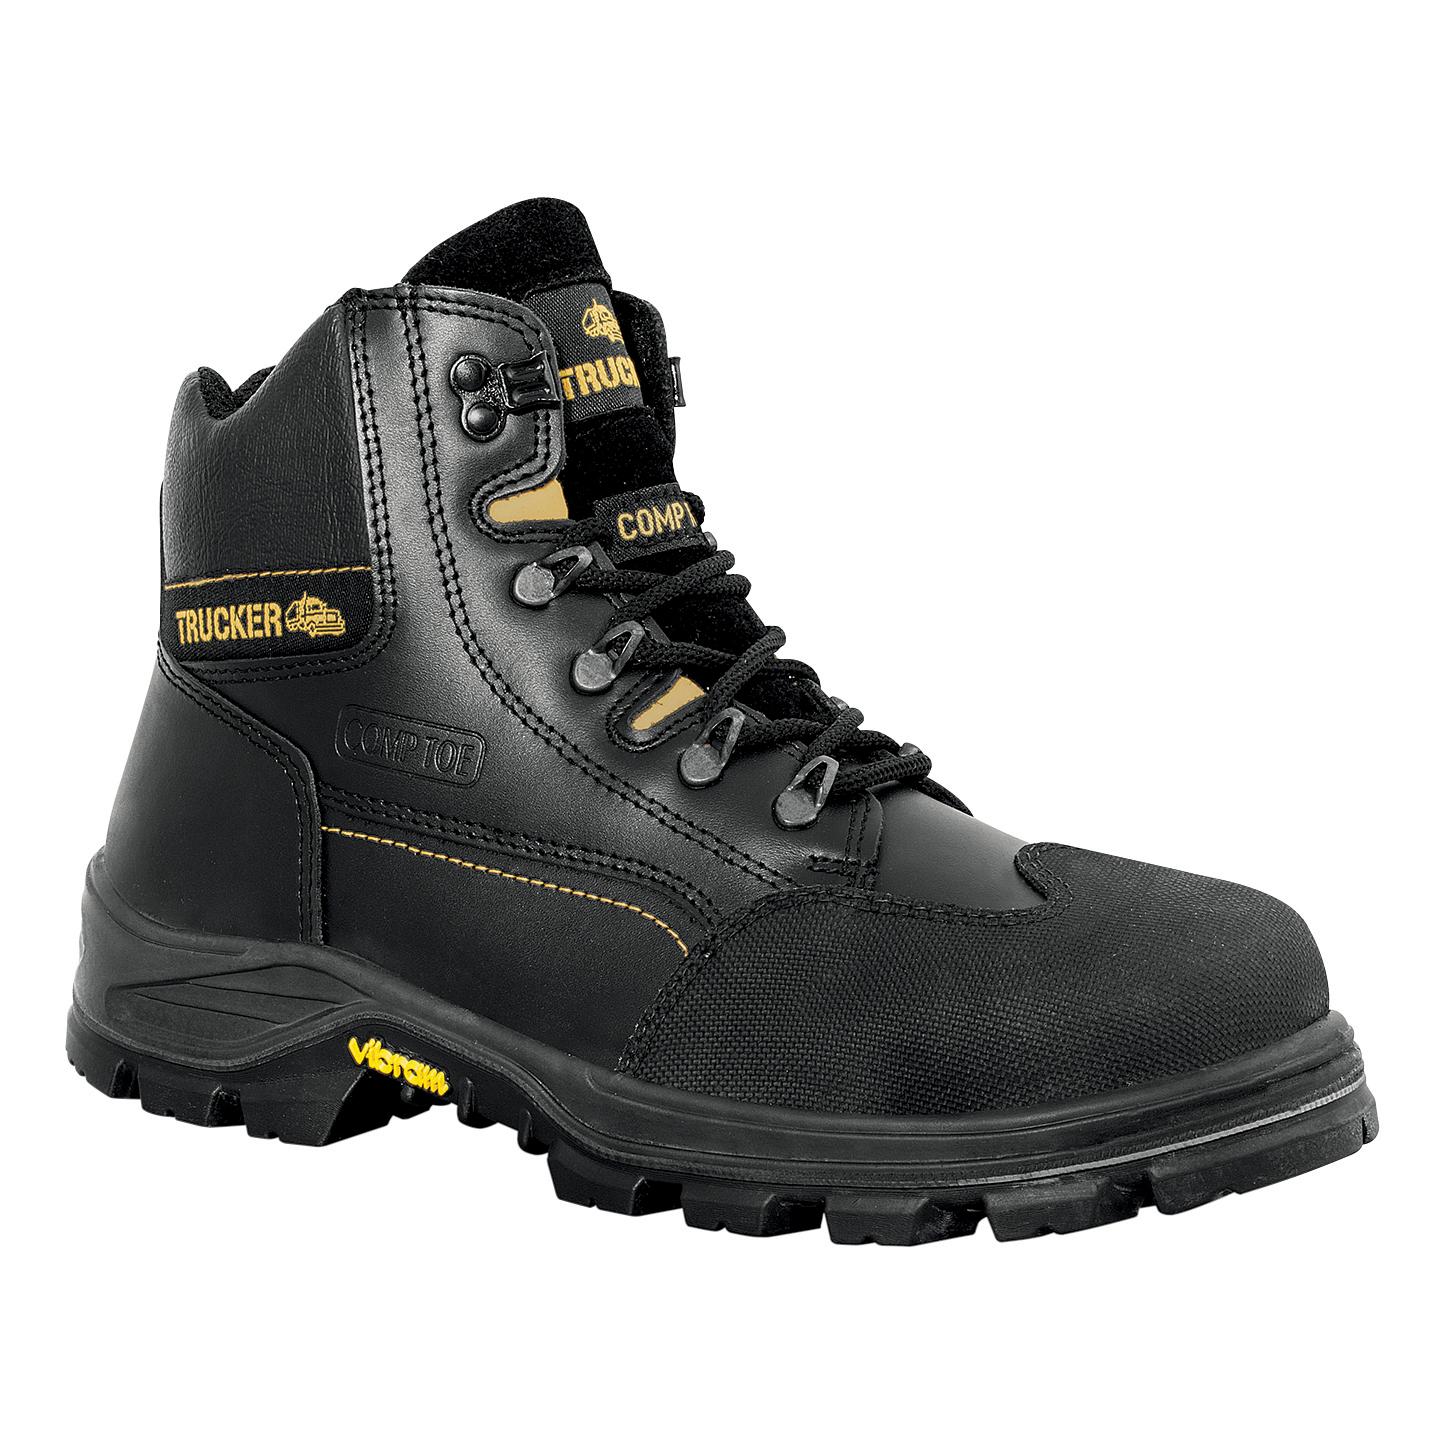 Aimont Revenger Safety Boots Protective Toecap Size 6 Black Ref 7TR0606 Pair